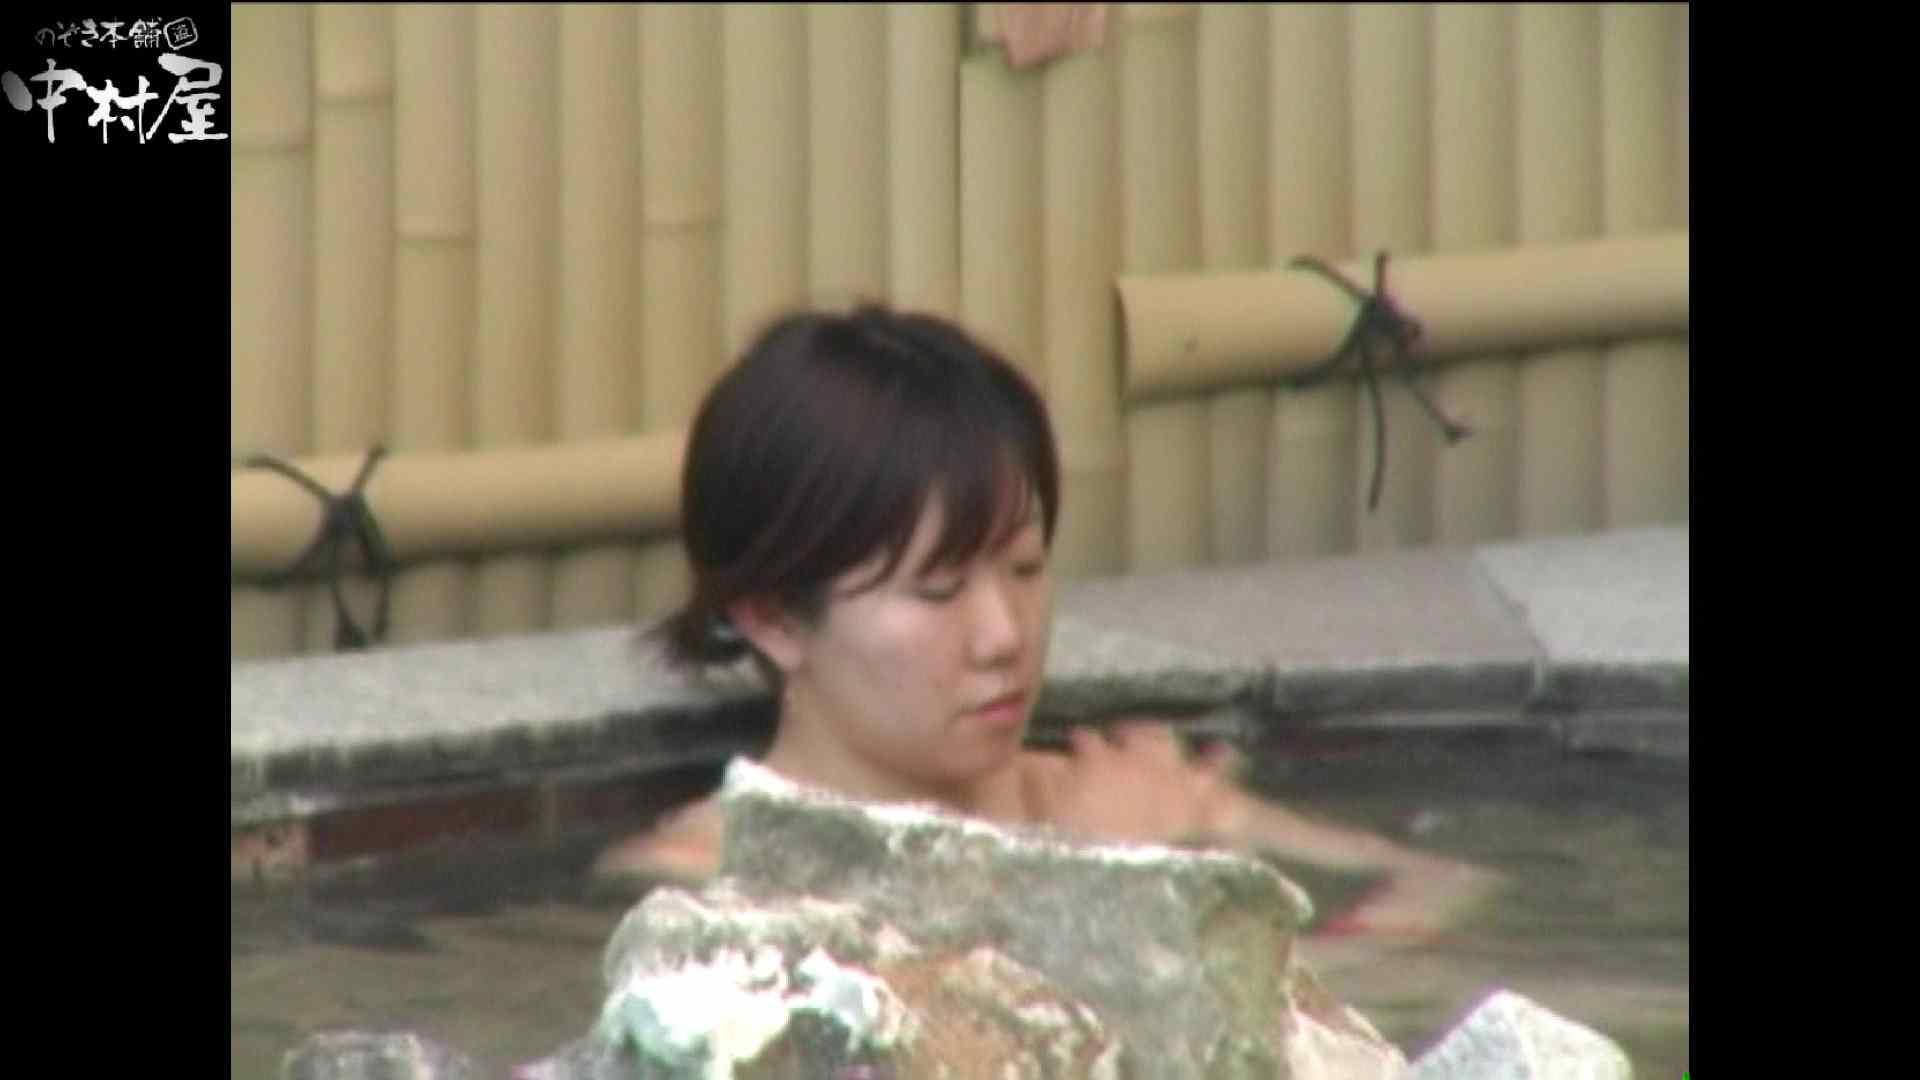 Aquaな露天風呂Vol.977 盗撮師作品 | 露天風呂突入  83pic 28